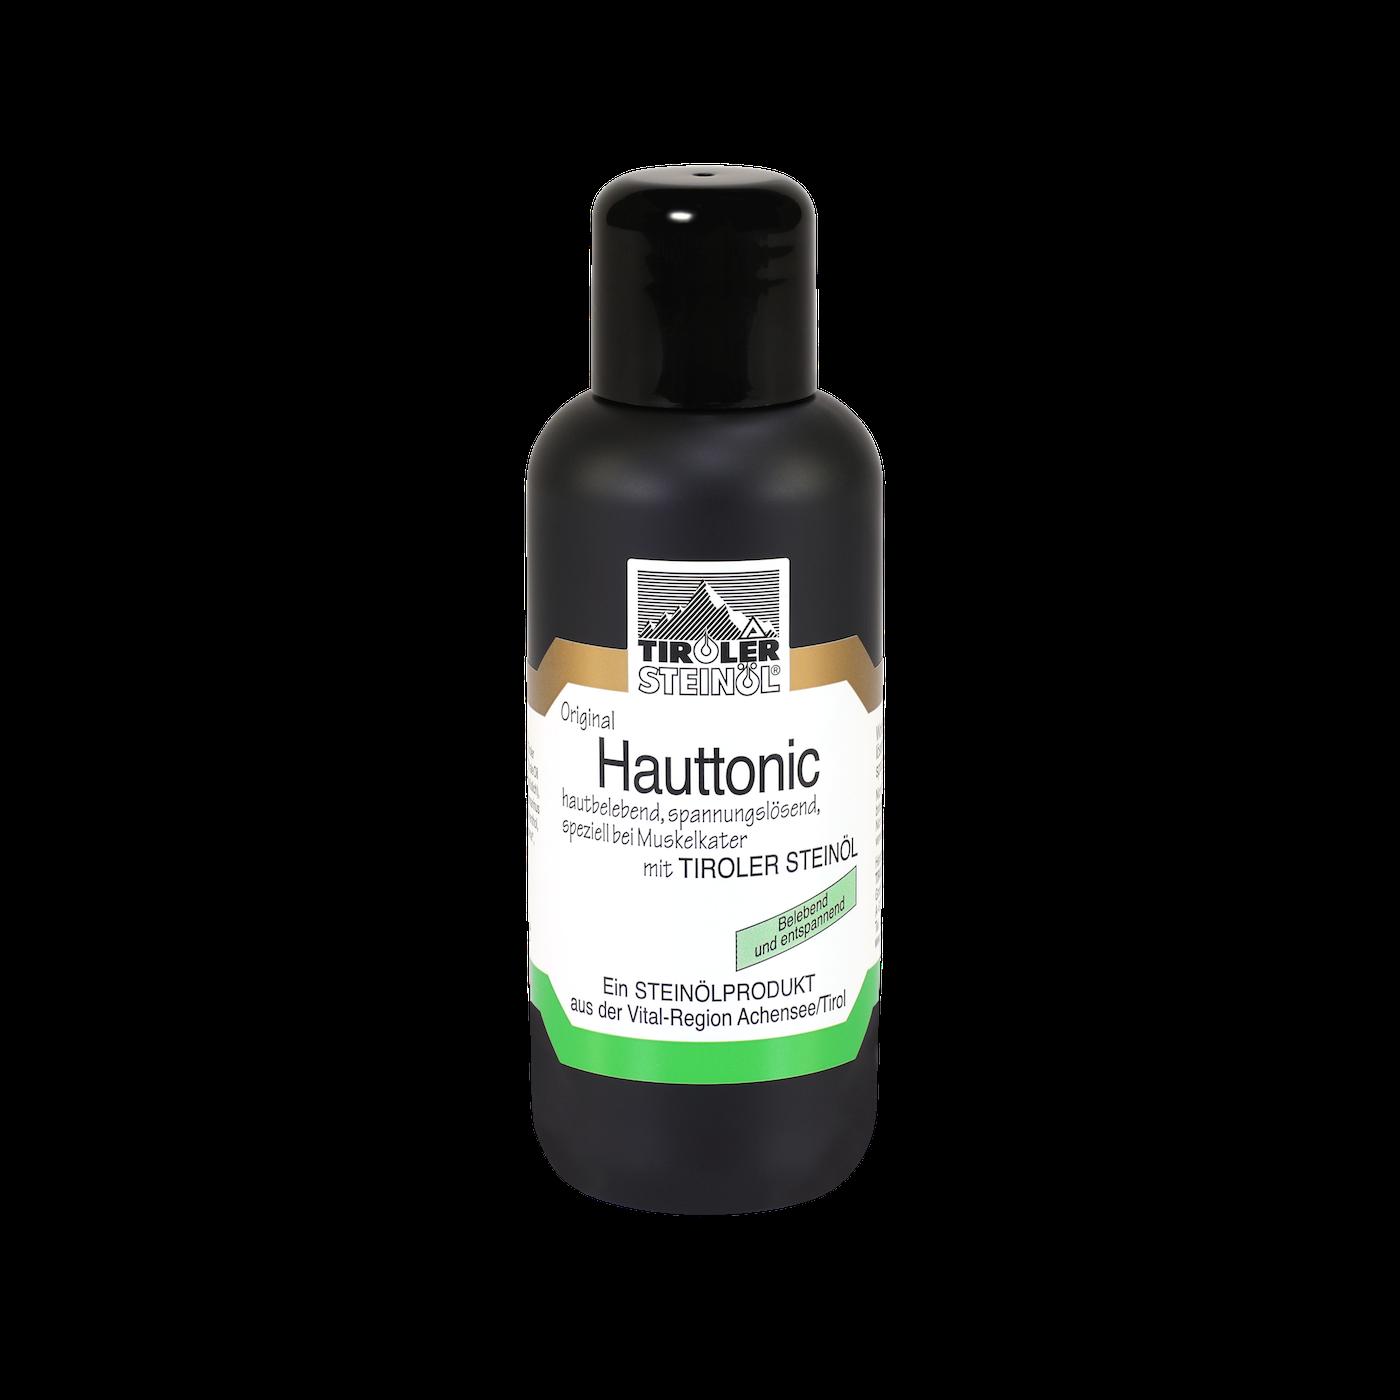 Hauttonic mit TIROLER STEINÖL 200 ml